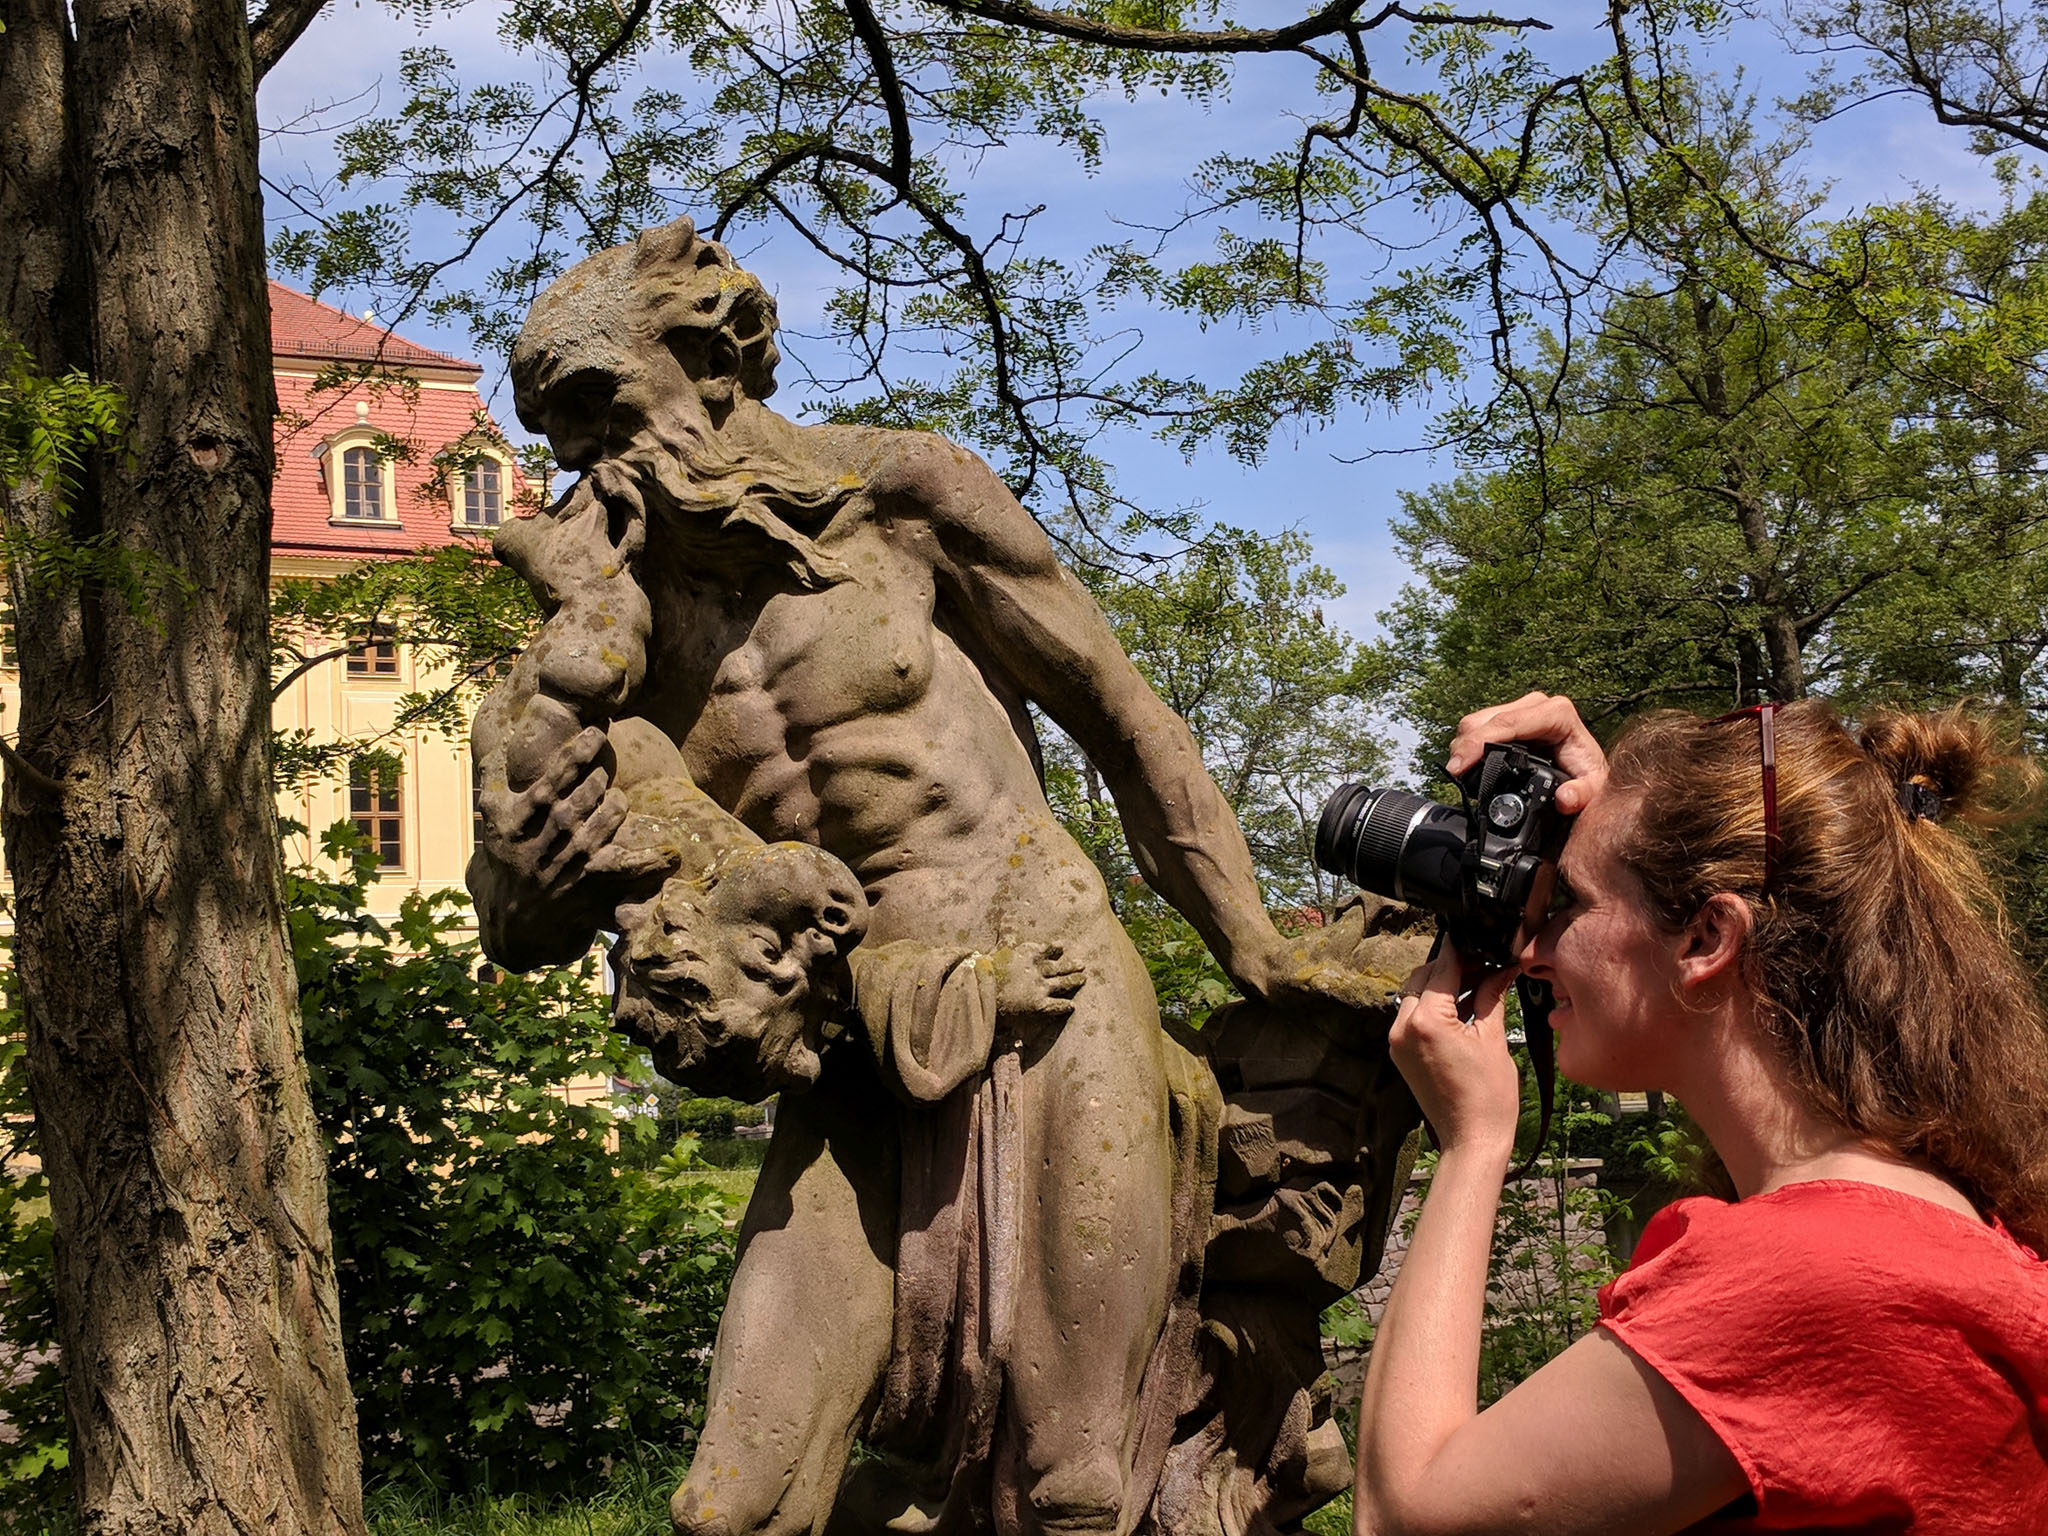 Barockschloss Wachau  , Park mit Chronos-Skulptur